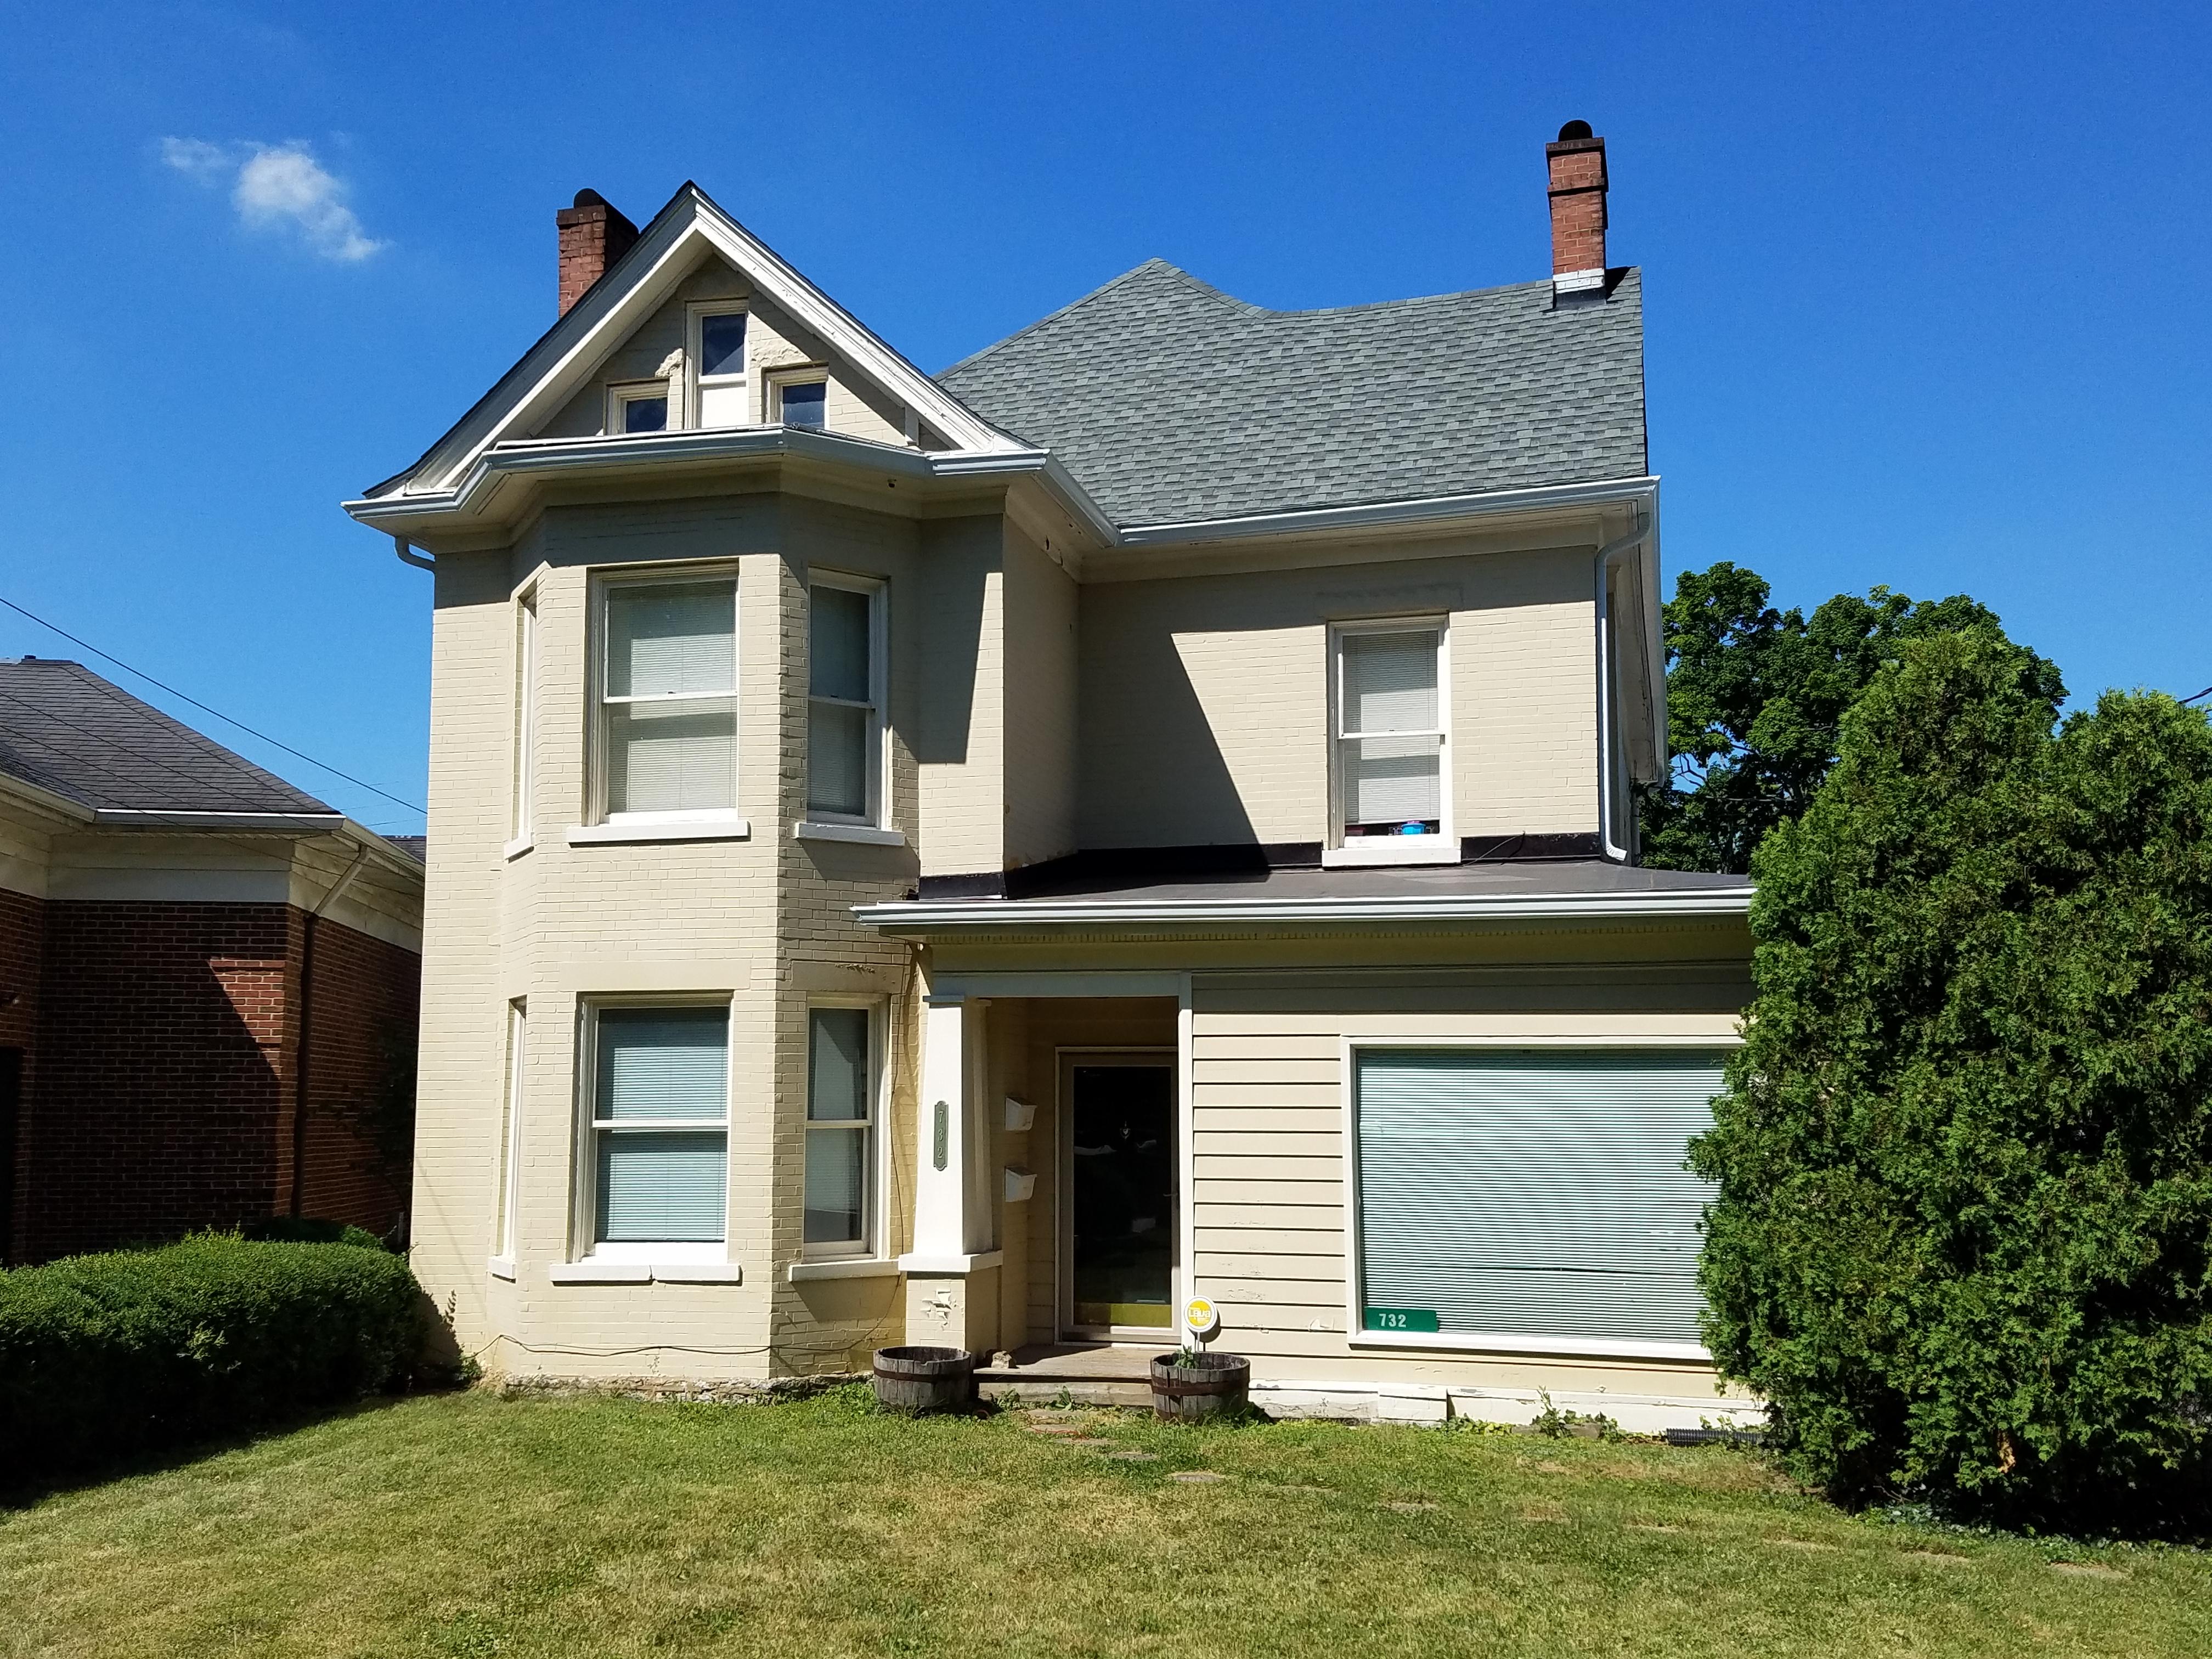 Aic Roofing Amp Construction Inc Lexington Kentucky Ky